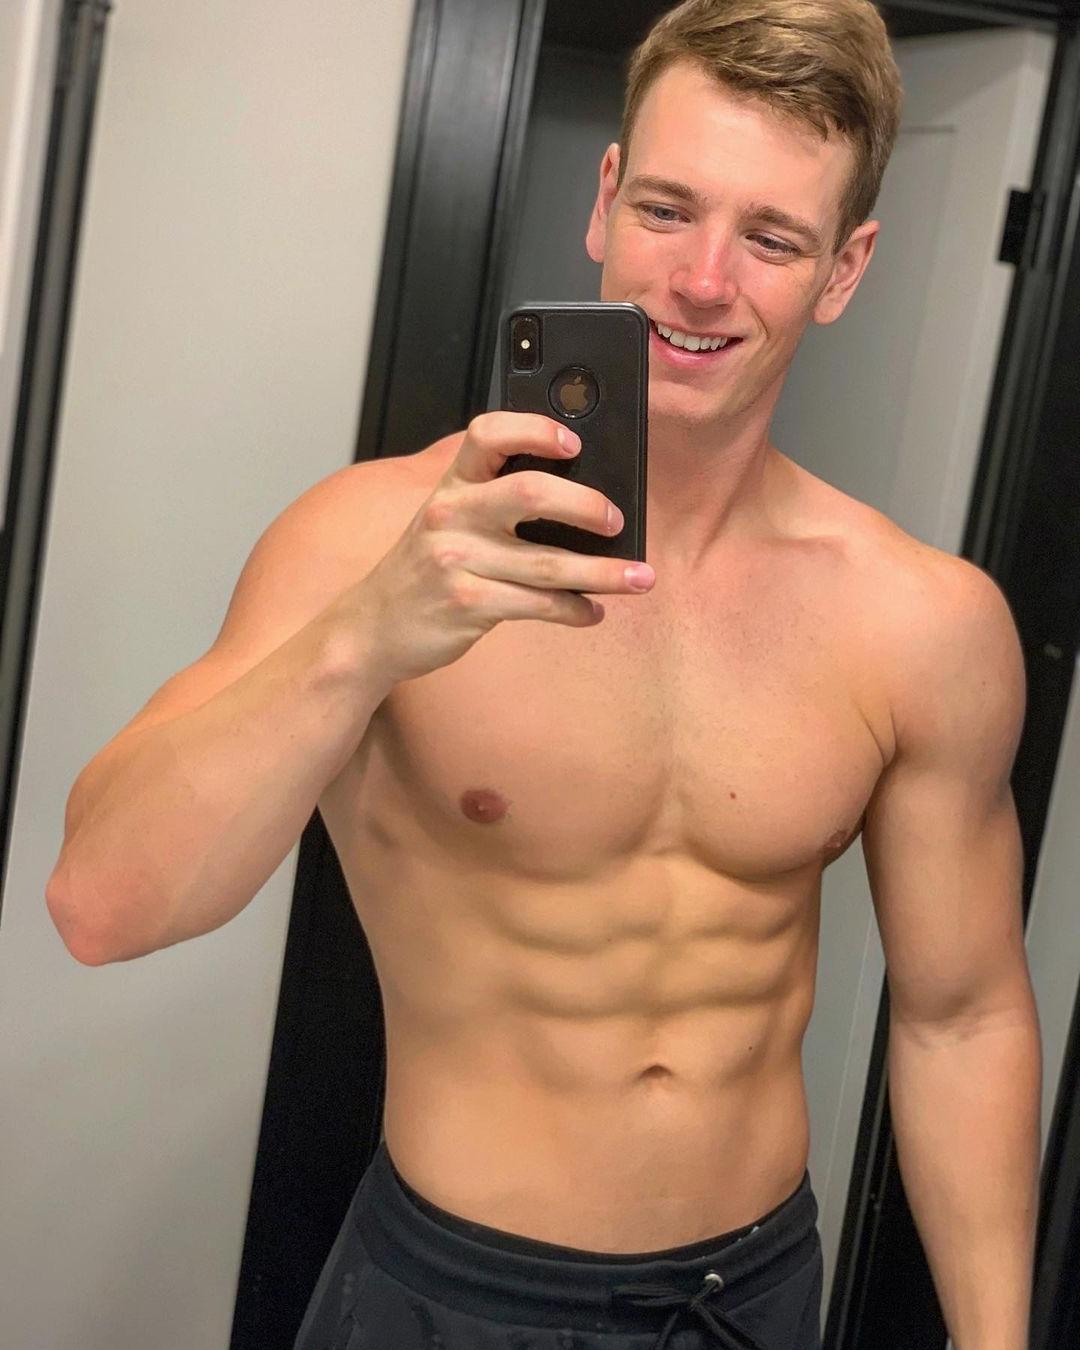 cute-red-nose-ginger-dude-ben-petersen-fit-shirtless-body-selfie-abs